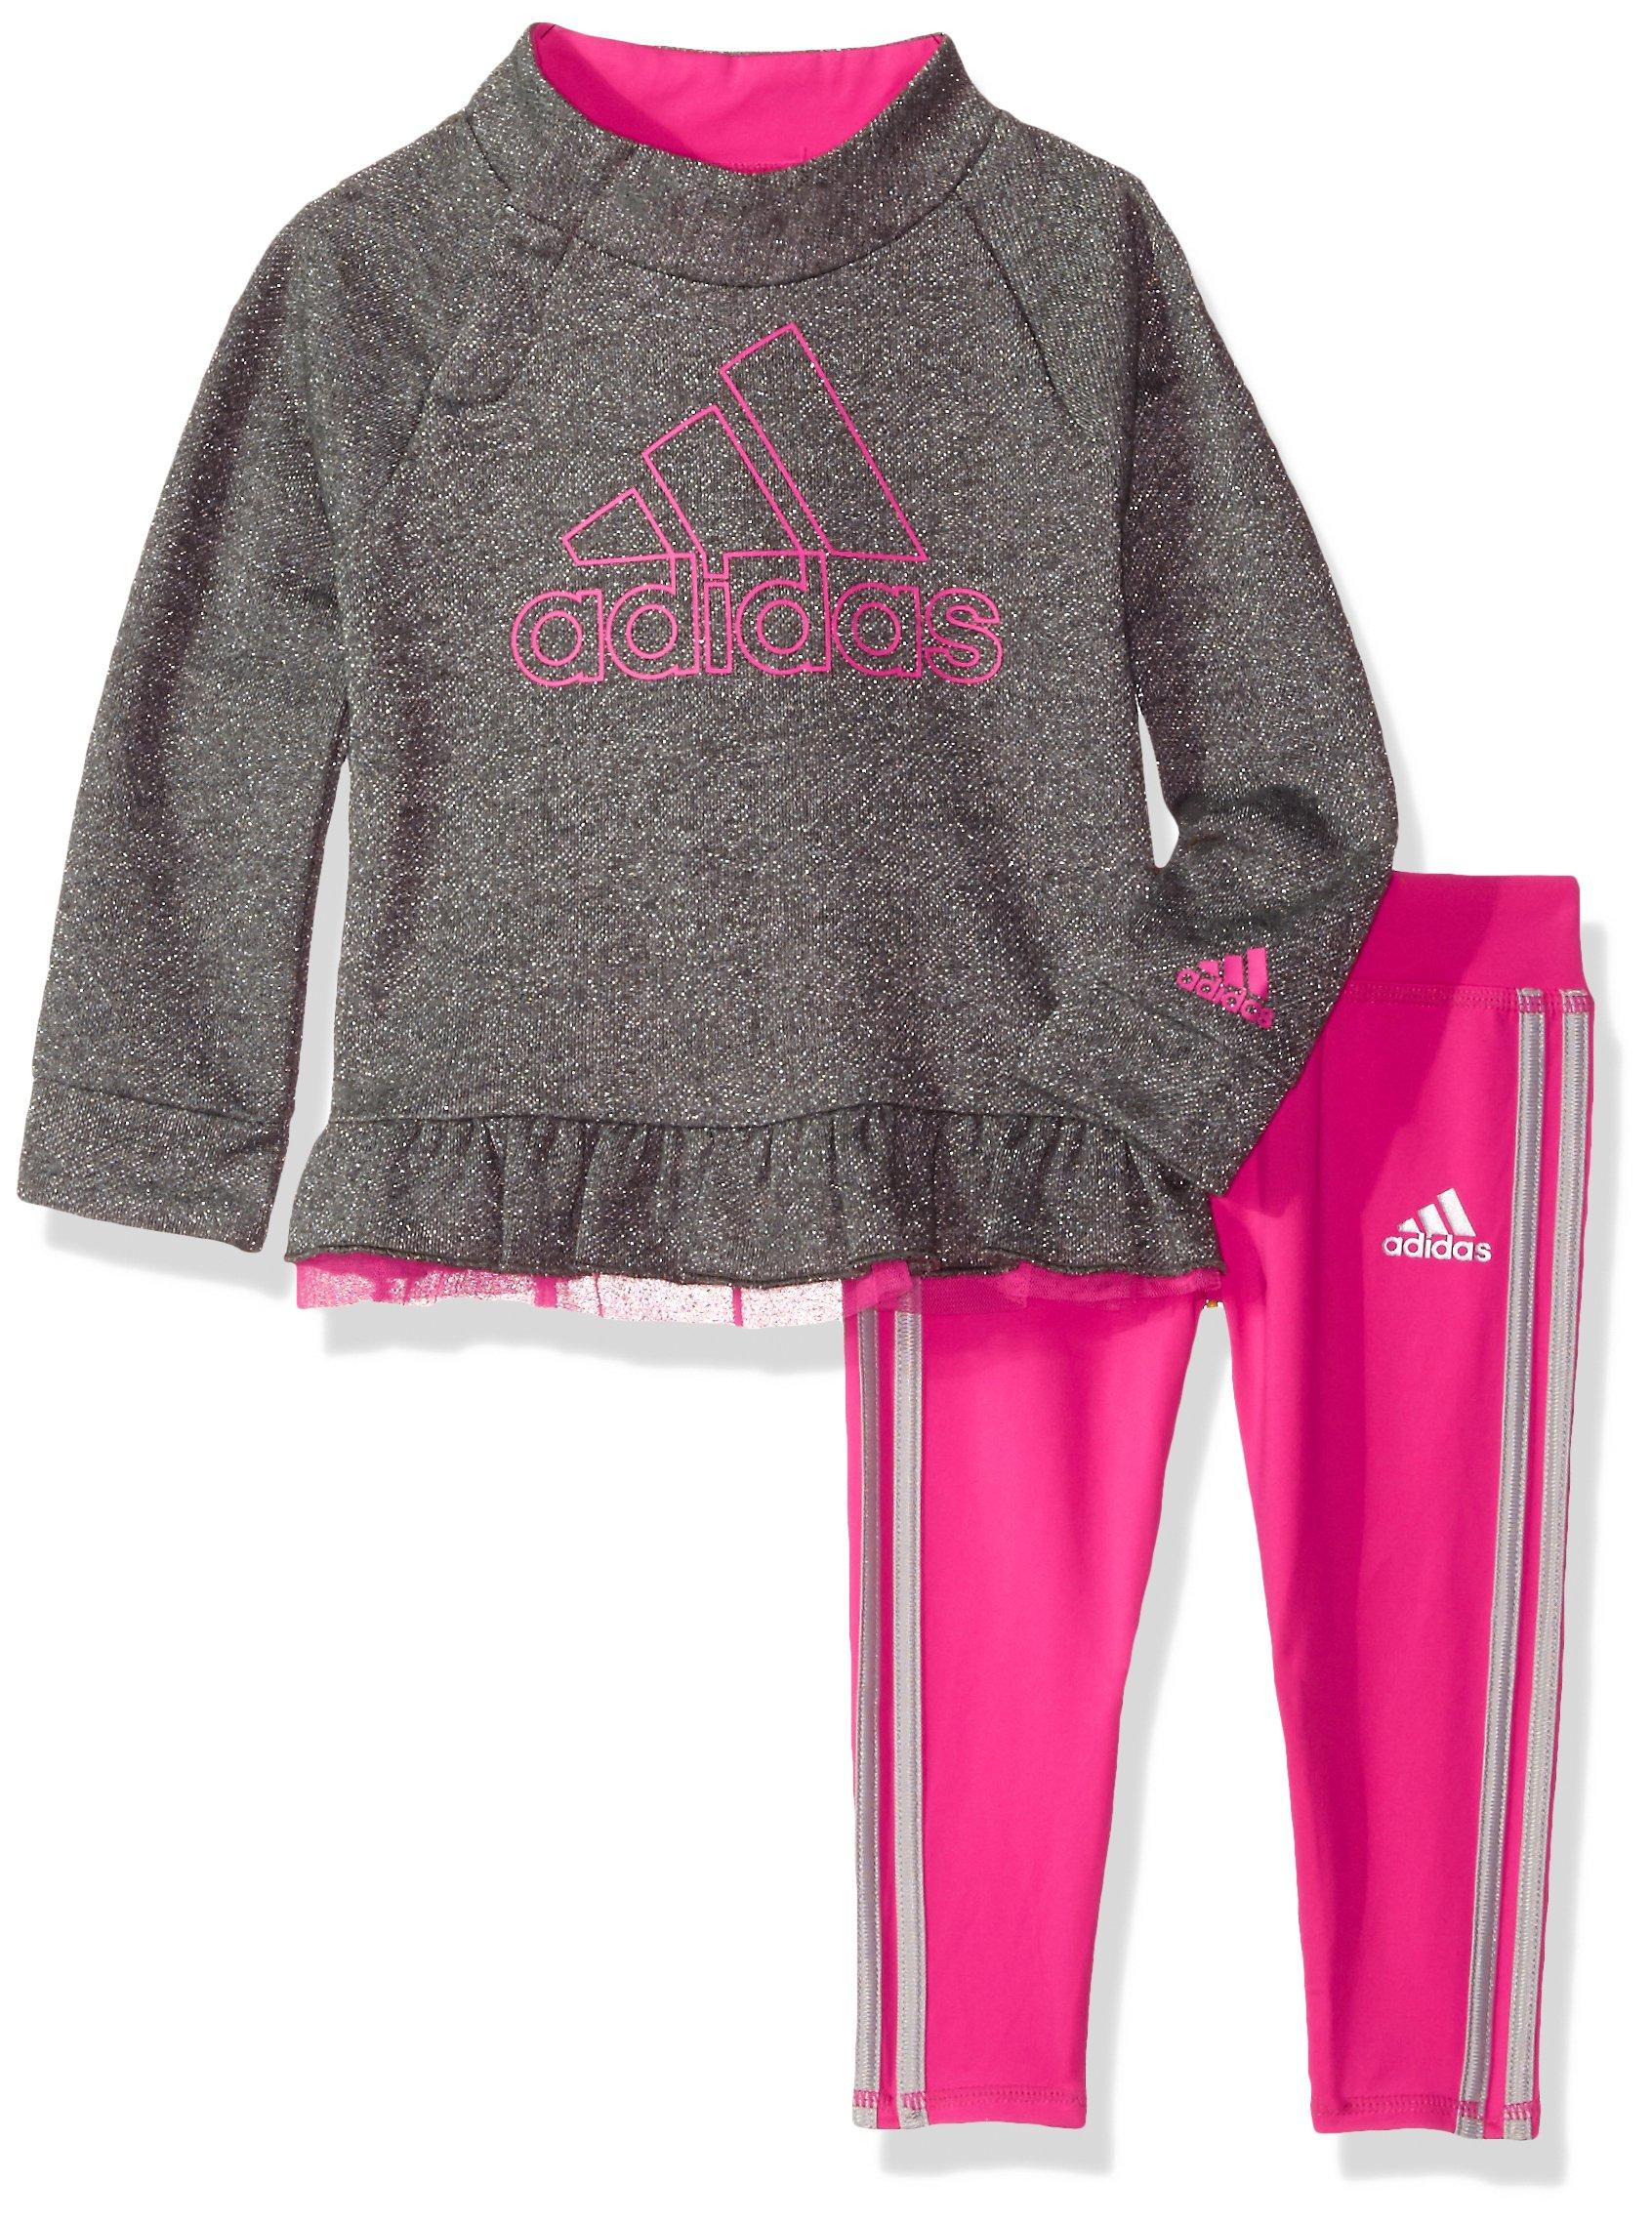 adidas Baby Girls Hoodie and Legging Set, Aqua Diamond, Large